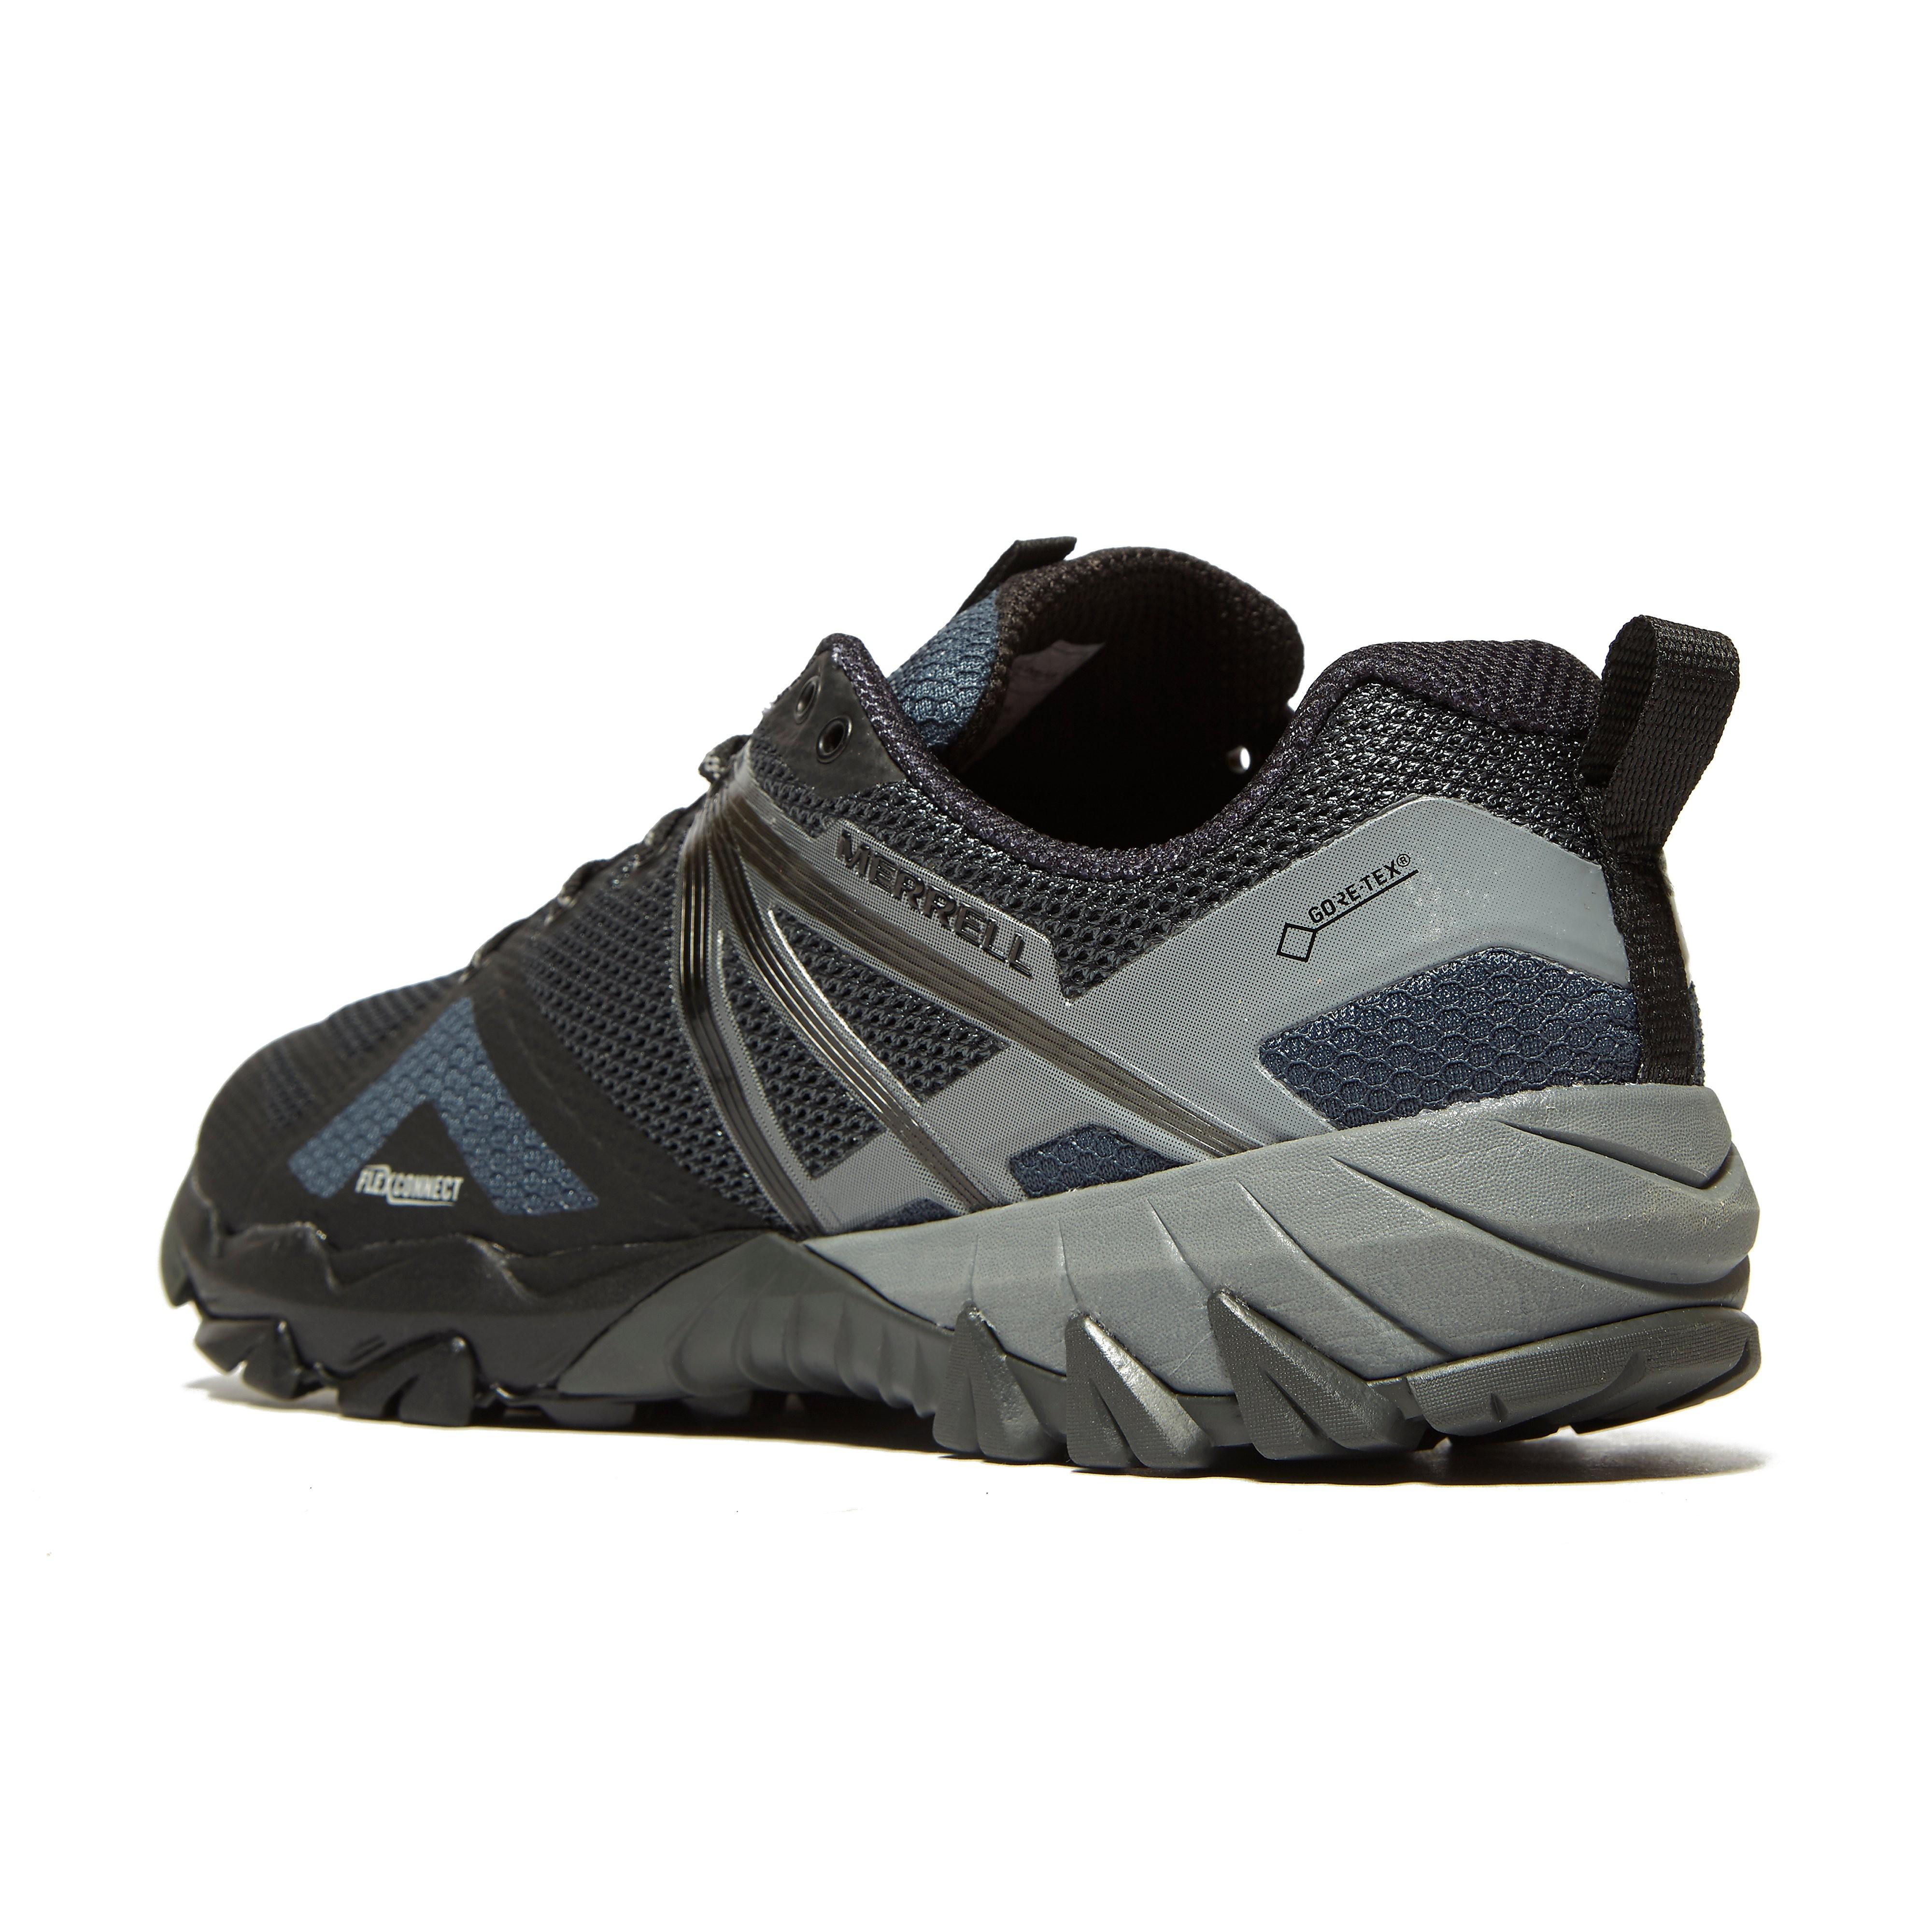 Merrell MQM Flex GTX Men's Walking Shoes